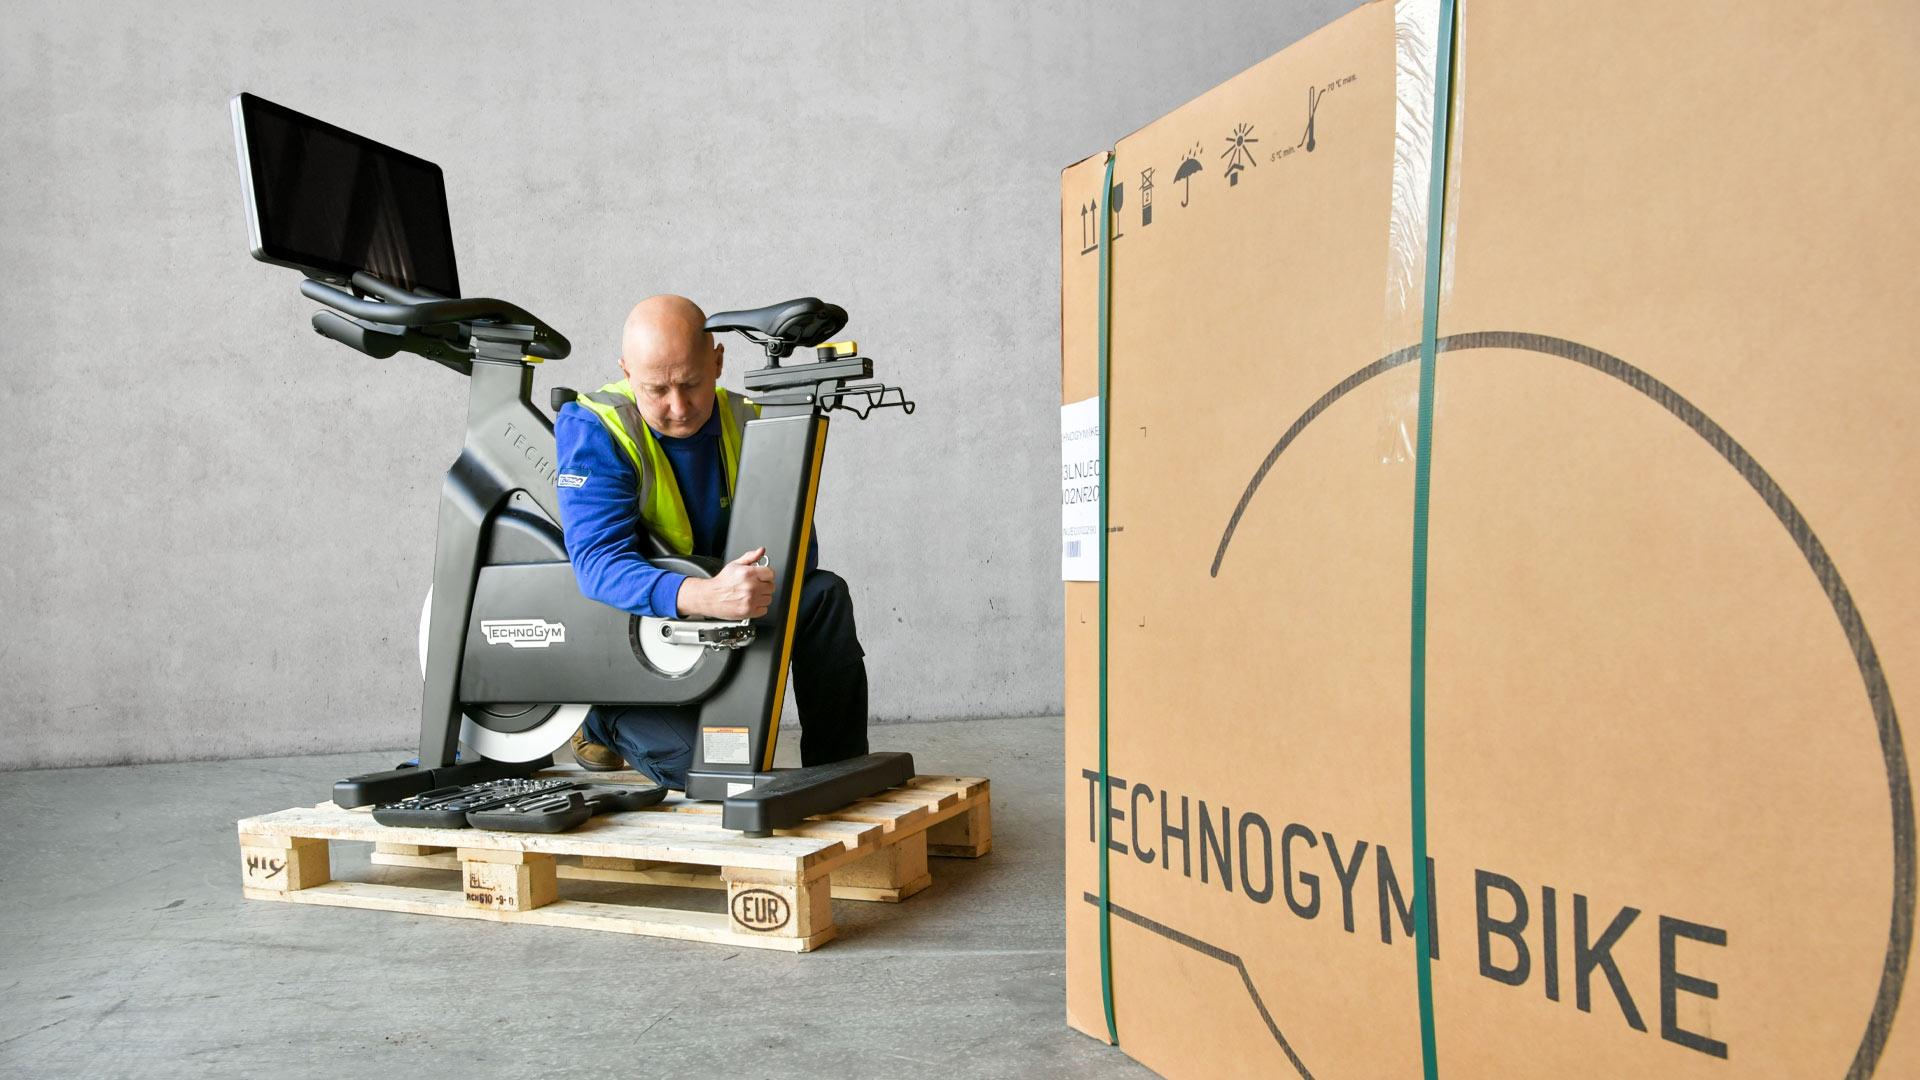 Bishopsgate-vision-building-bike